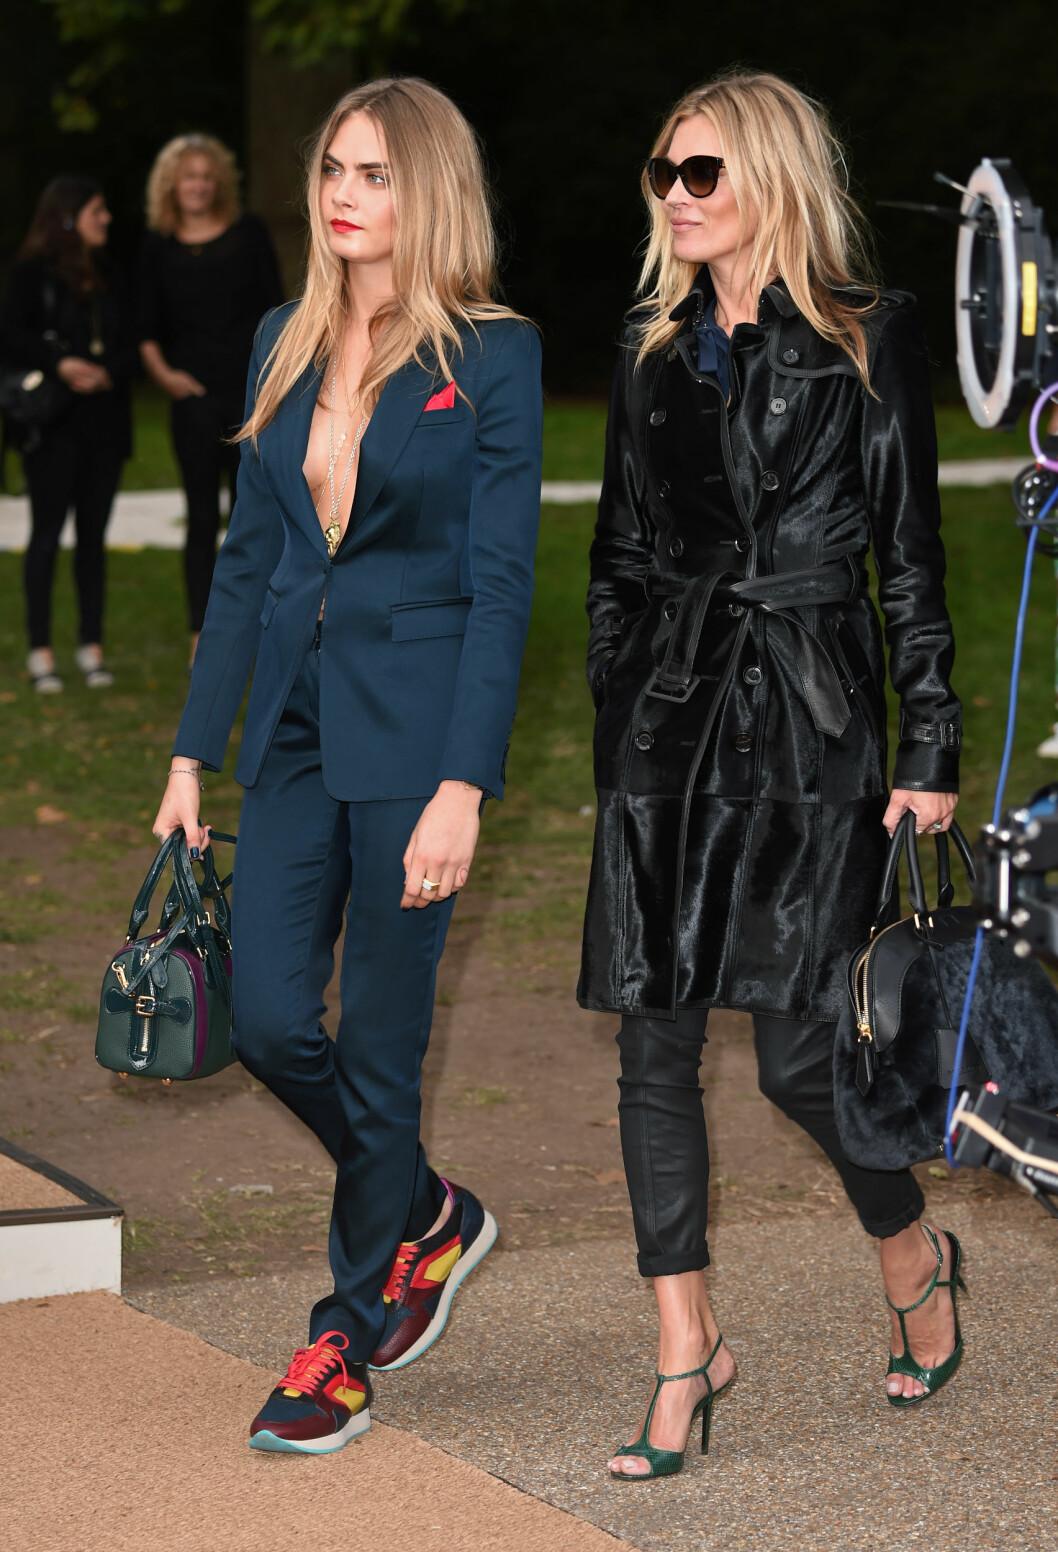 Supermodell Cara Delevingne møtte tidligere i høst på Burberry Prorsum-visningen i London med dress stylet med fargerike sneakers.  Foto: All Over